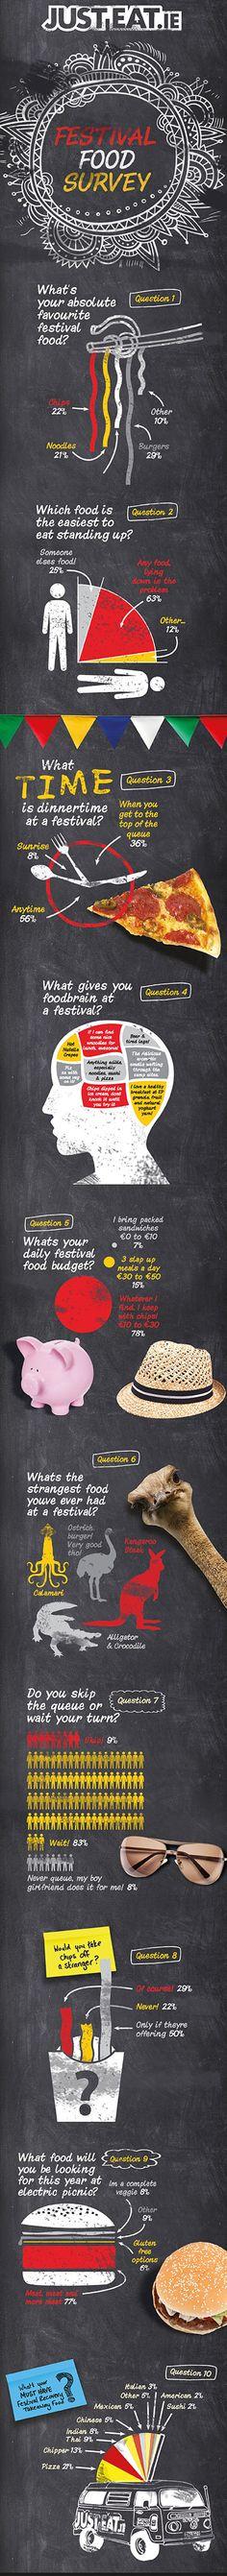 Festival Food Survey #Infographic!